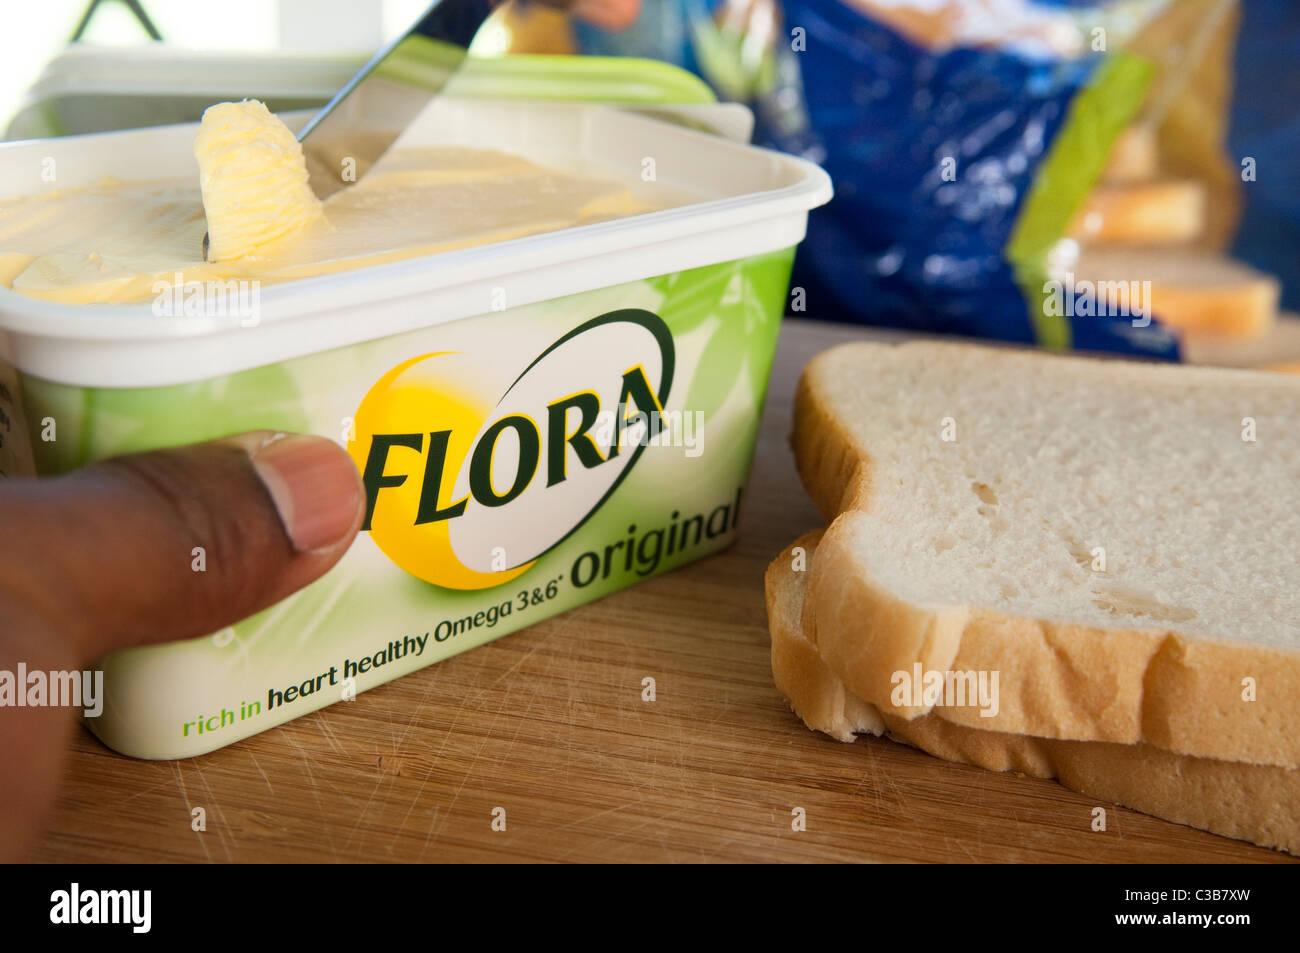 Illustrative image of Flora Original, a Unilever food product. - Stock Image